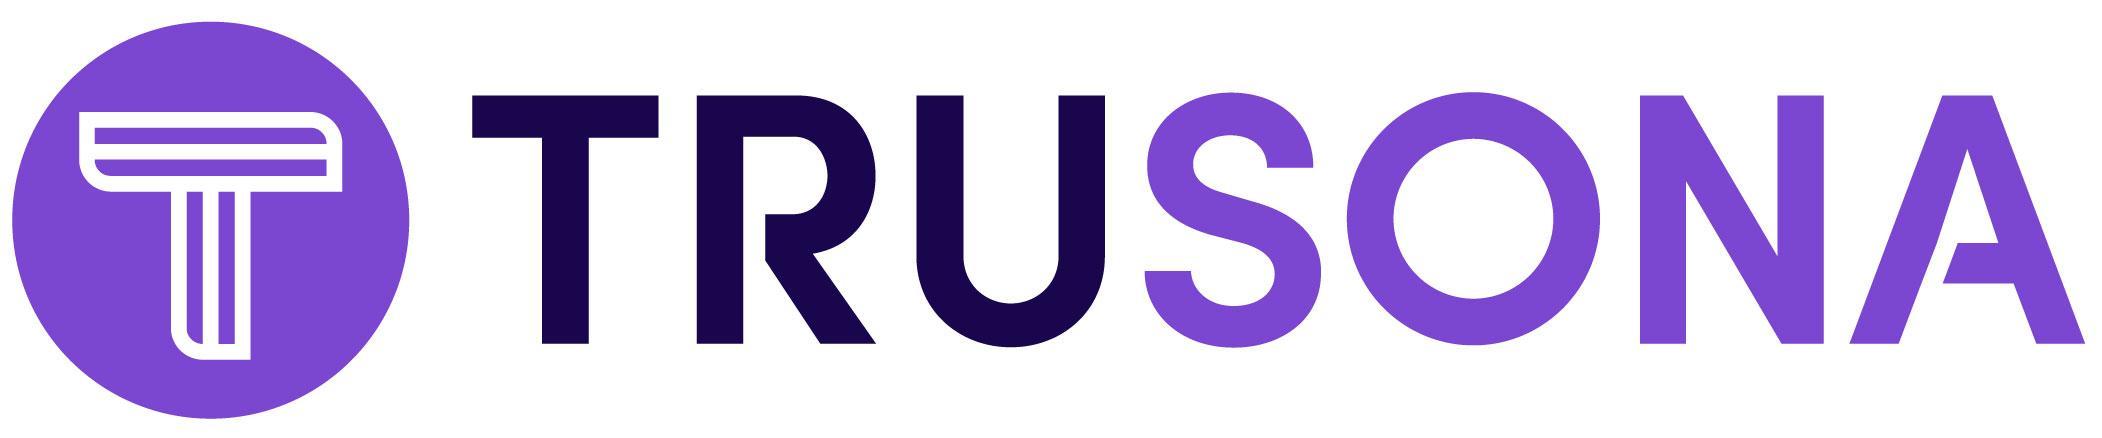 Trusona-2017-Logo.jpg